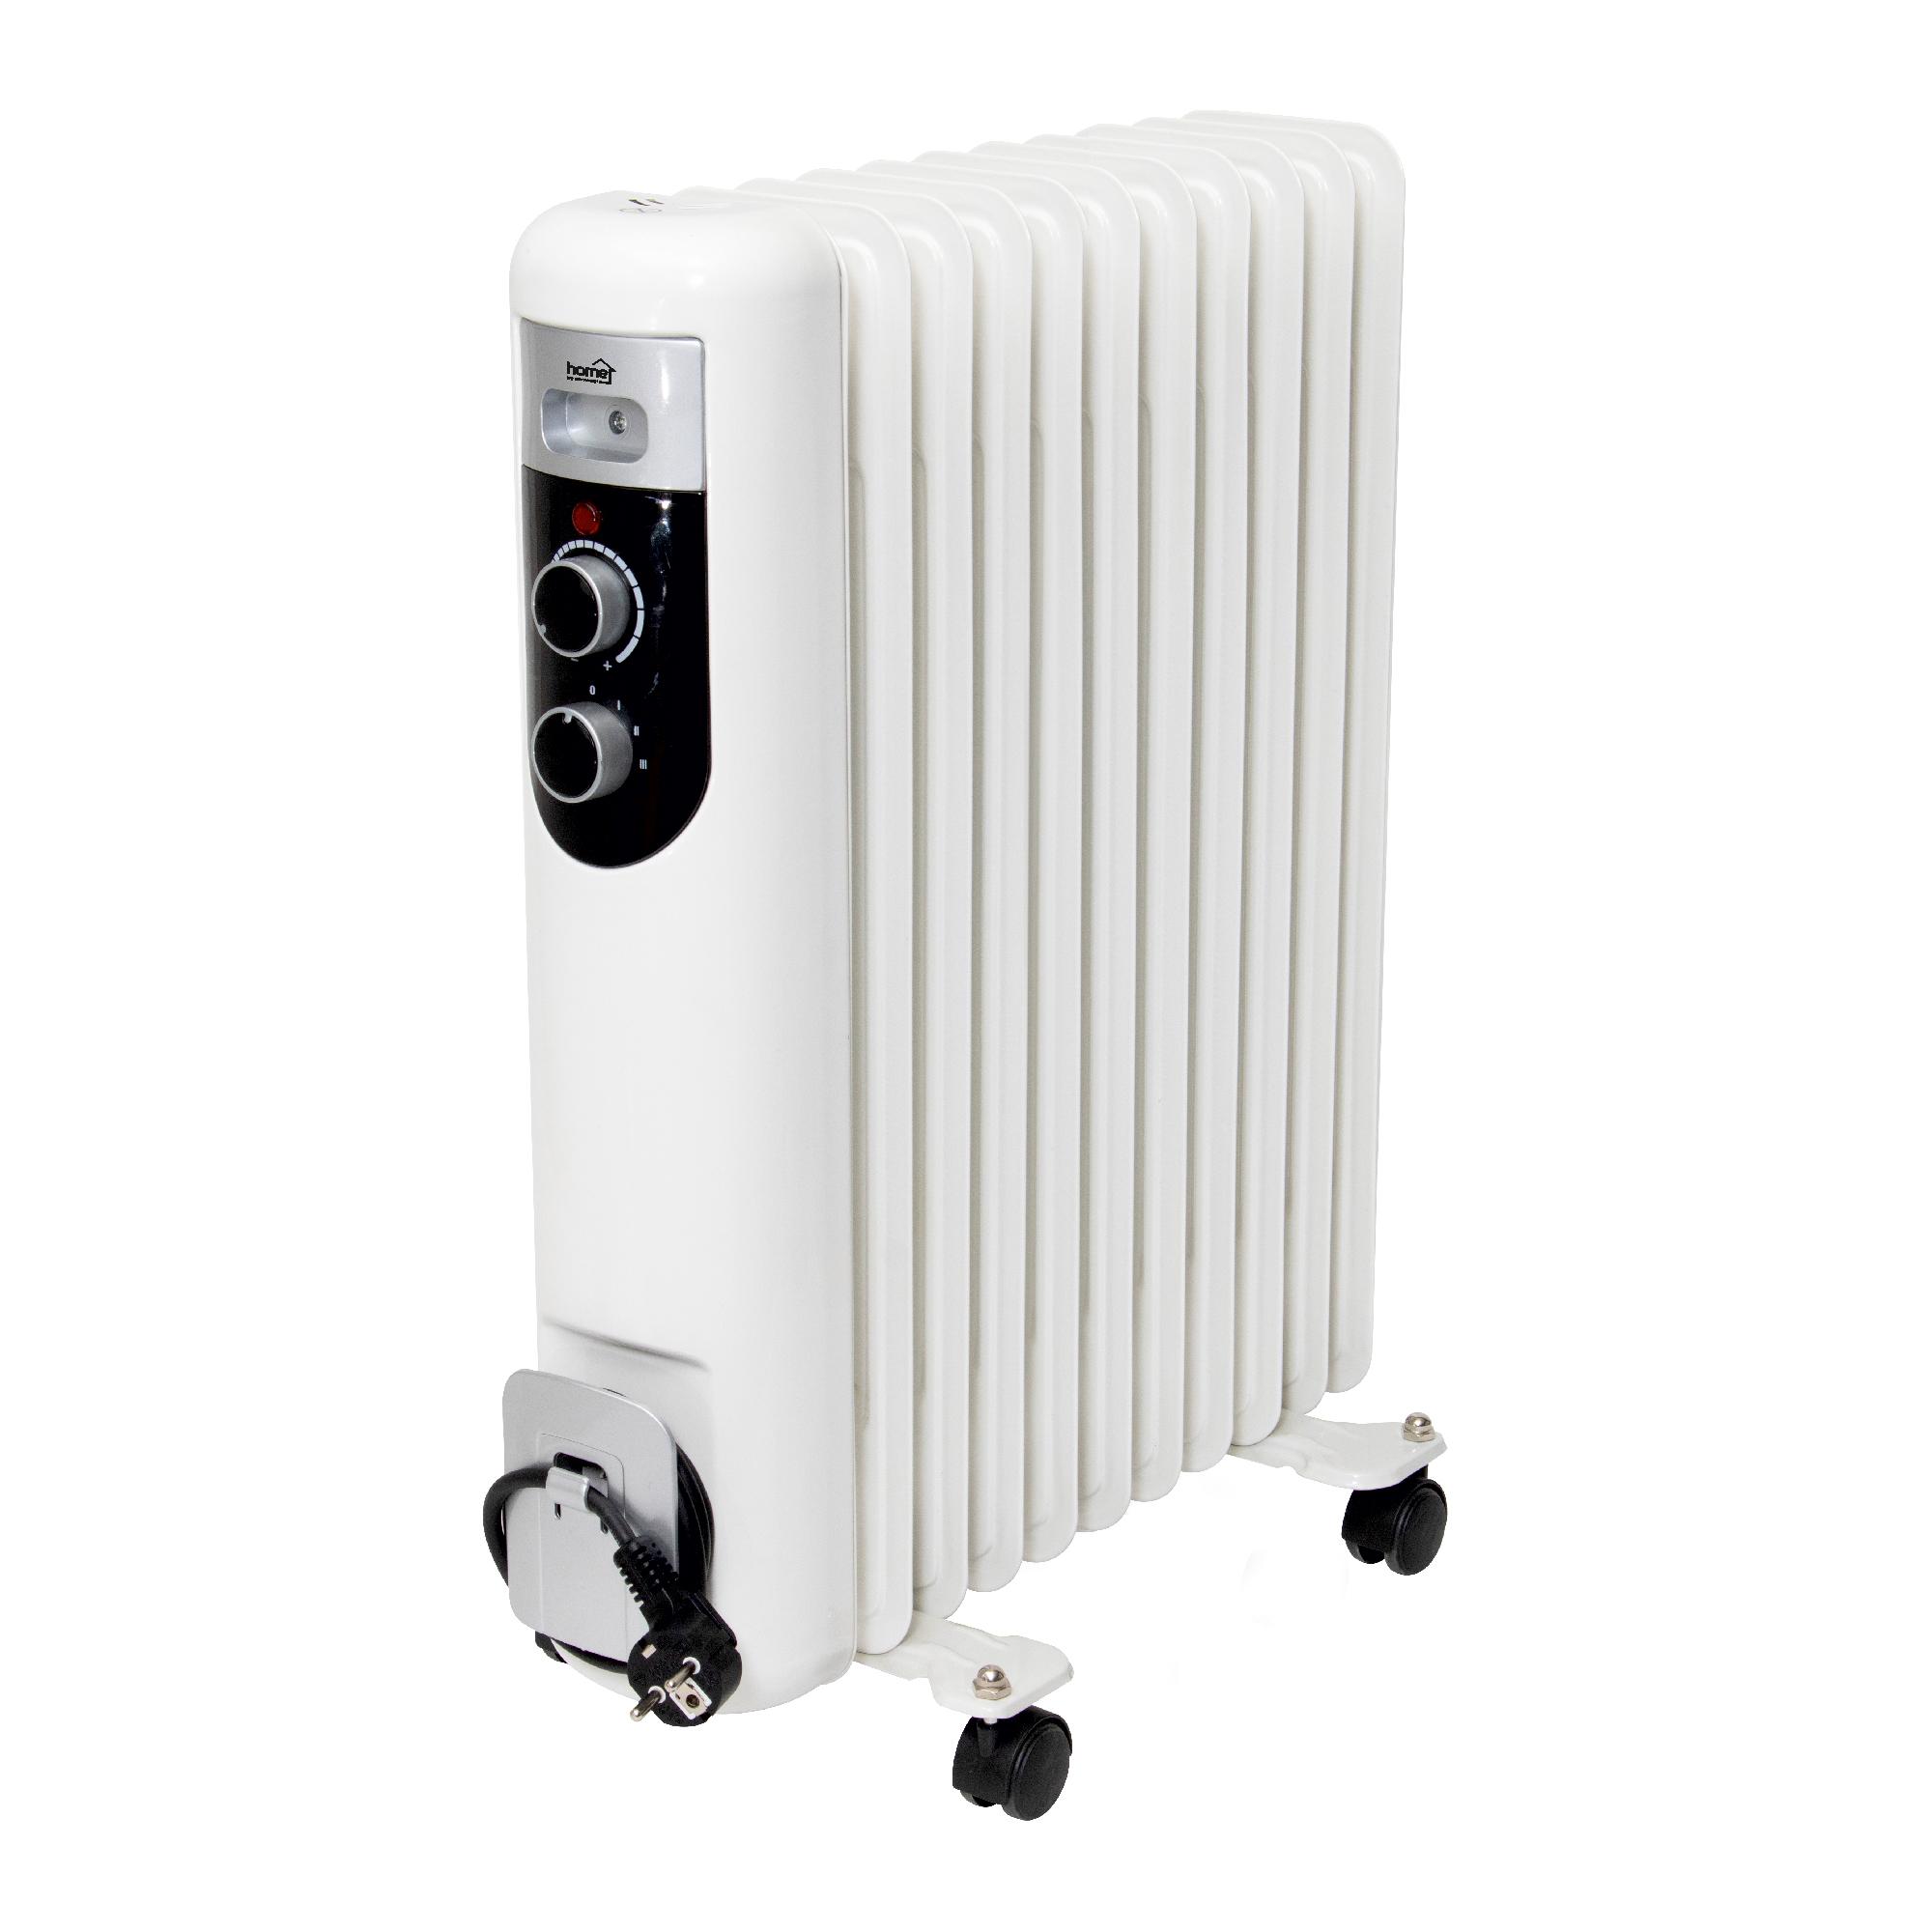 Calorifer electric cu ulei Home by somogyi FKOS 11M, 2 panouri convectoare, 2000W, aluminiu, alb, 60 x 51 cm imagine 2021 mathaus